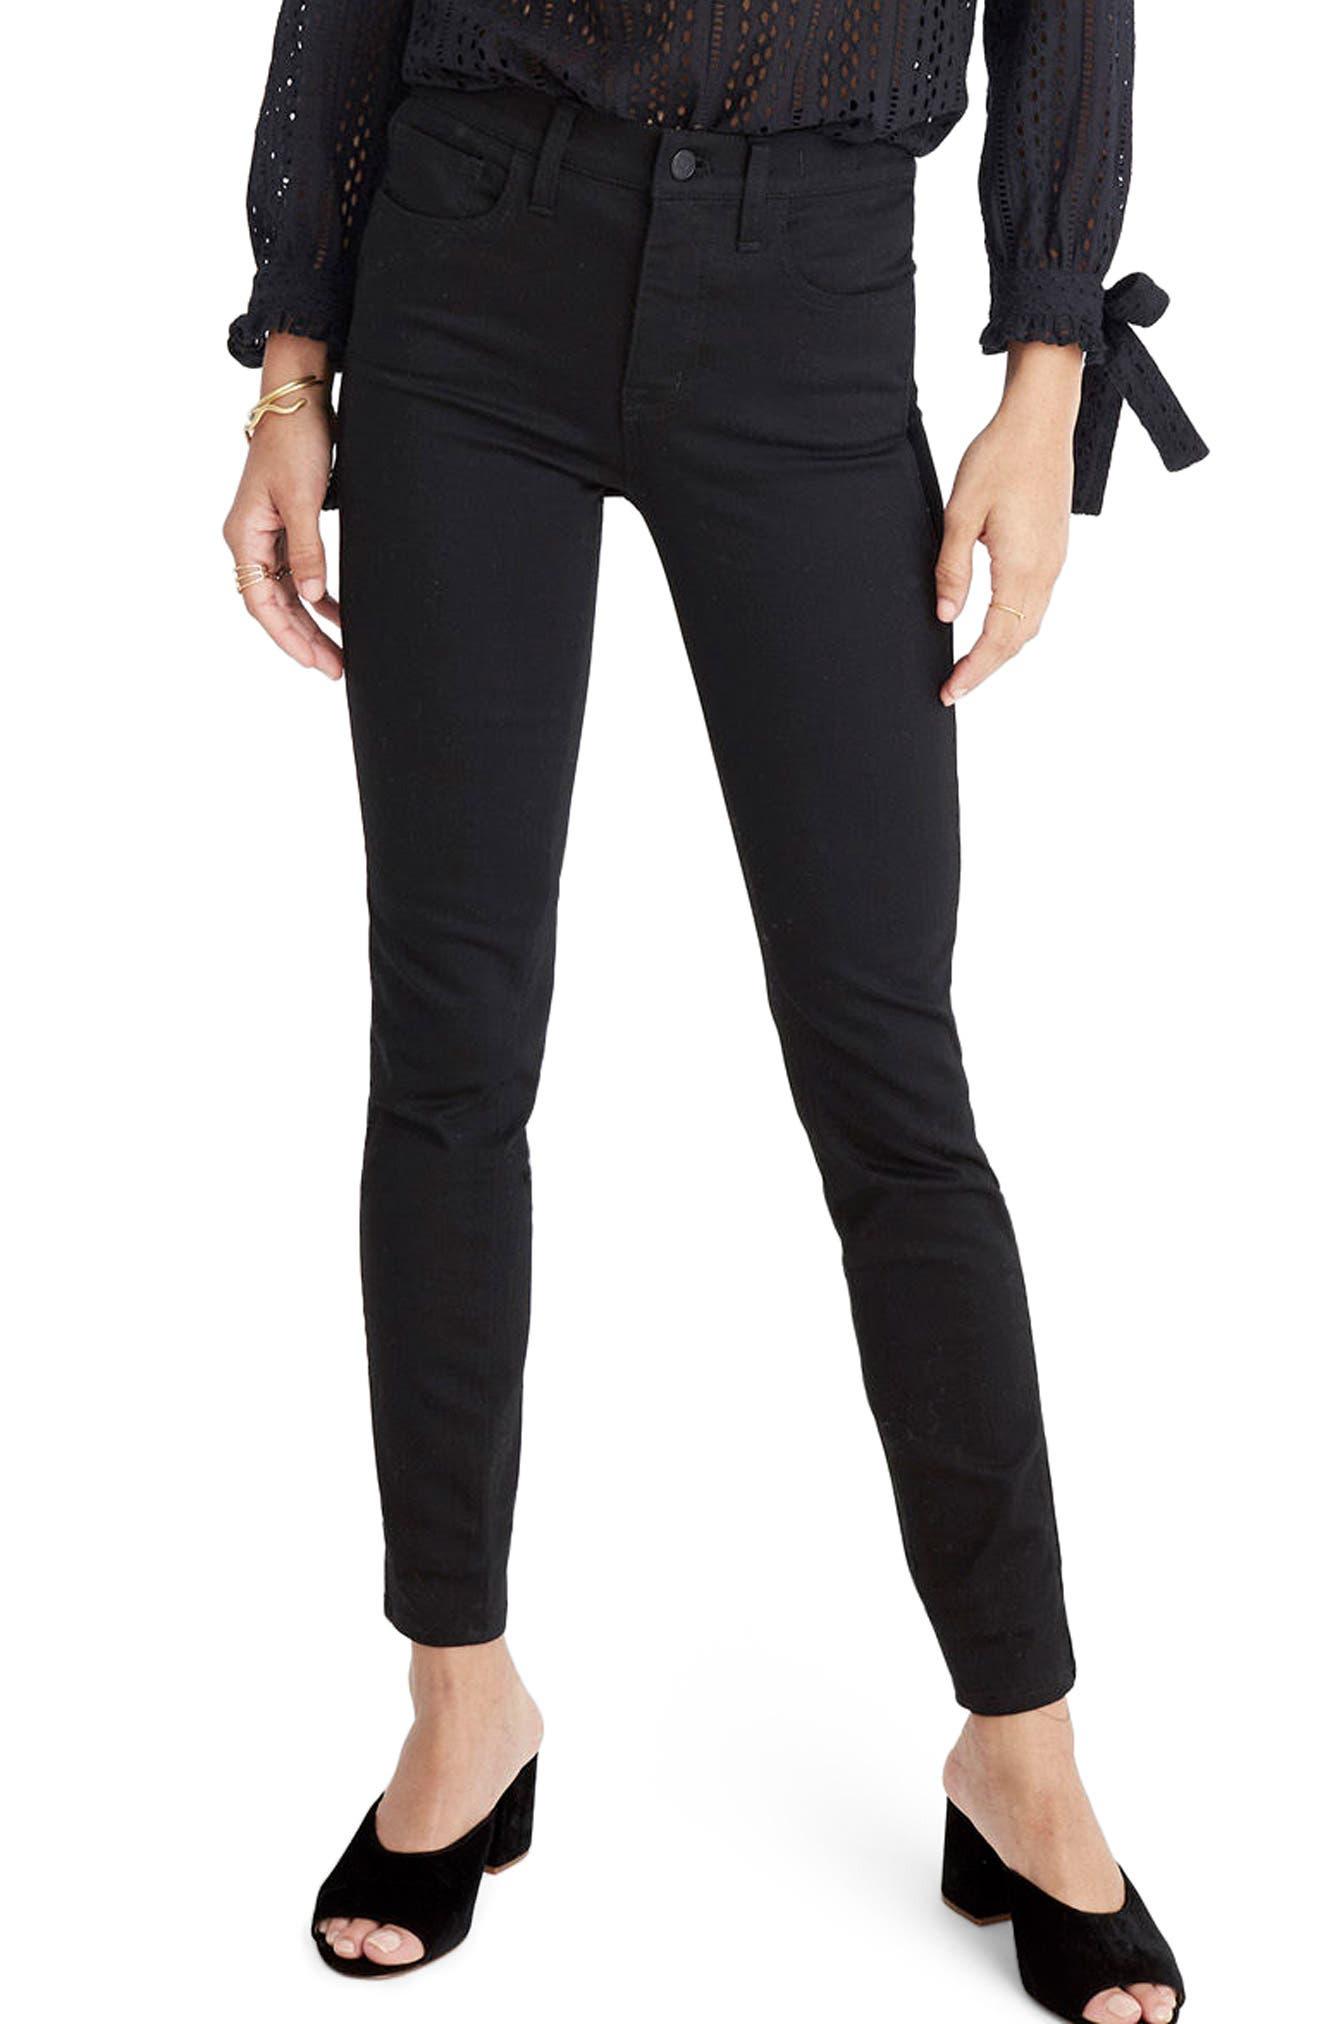 Alternate Image 1 Selected - Madewell 9-Inch High Waist Tuxedo Stripe Skinny Jeans (Esther)